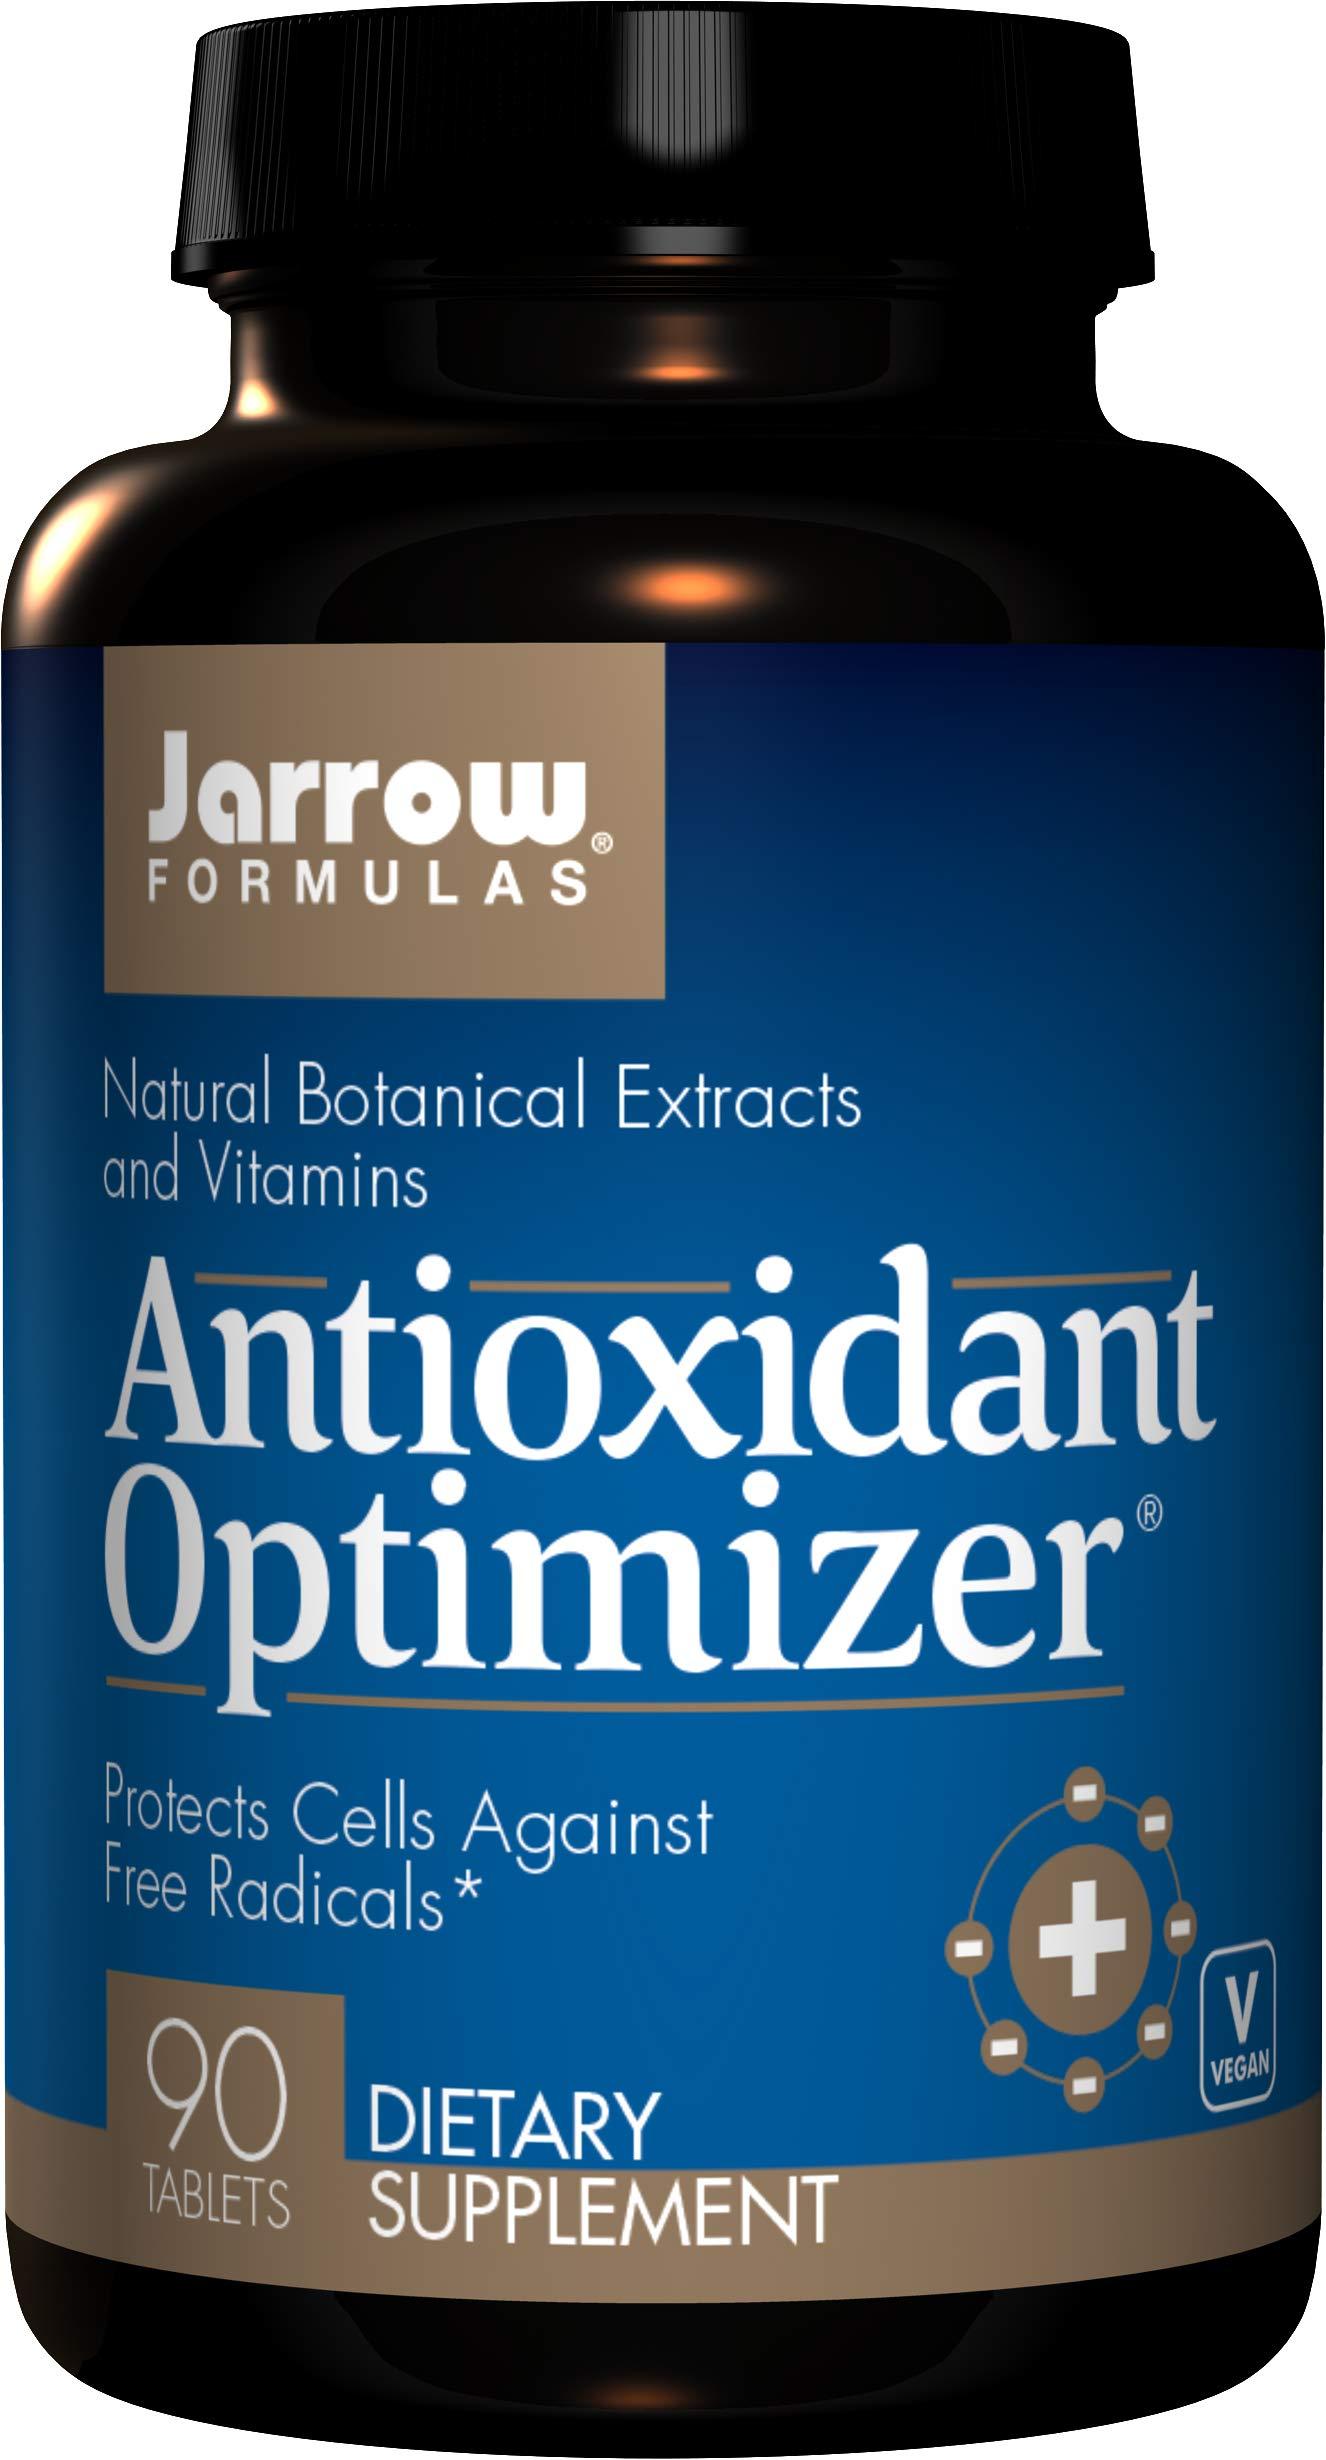 Jarrow Formulas Antioxidant Optimizer, Supports Vision, Cardiovascular Health, 90 Tabs by Jarrow Formulas